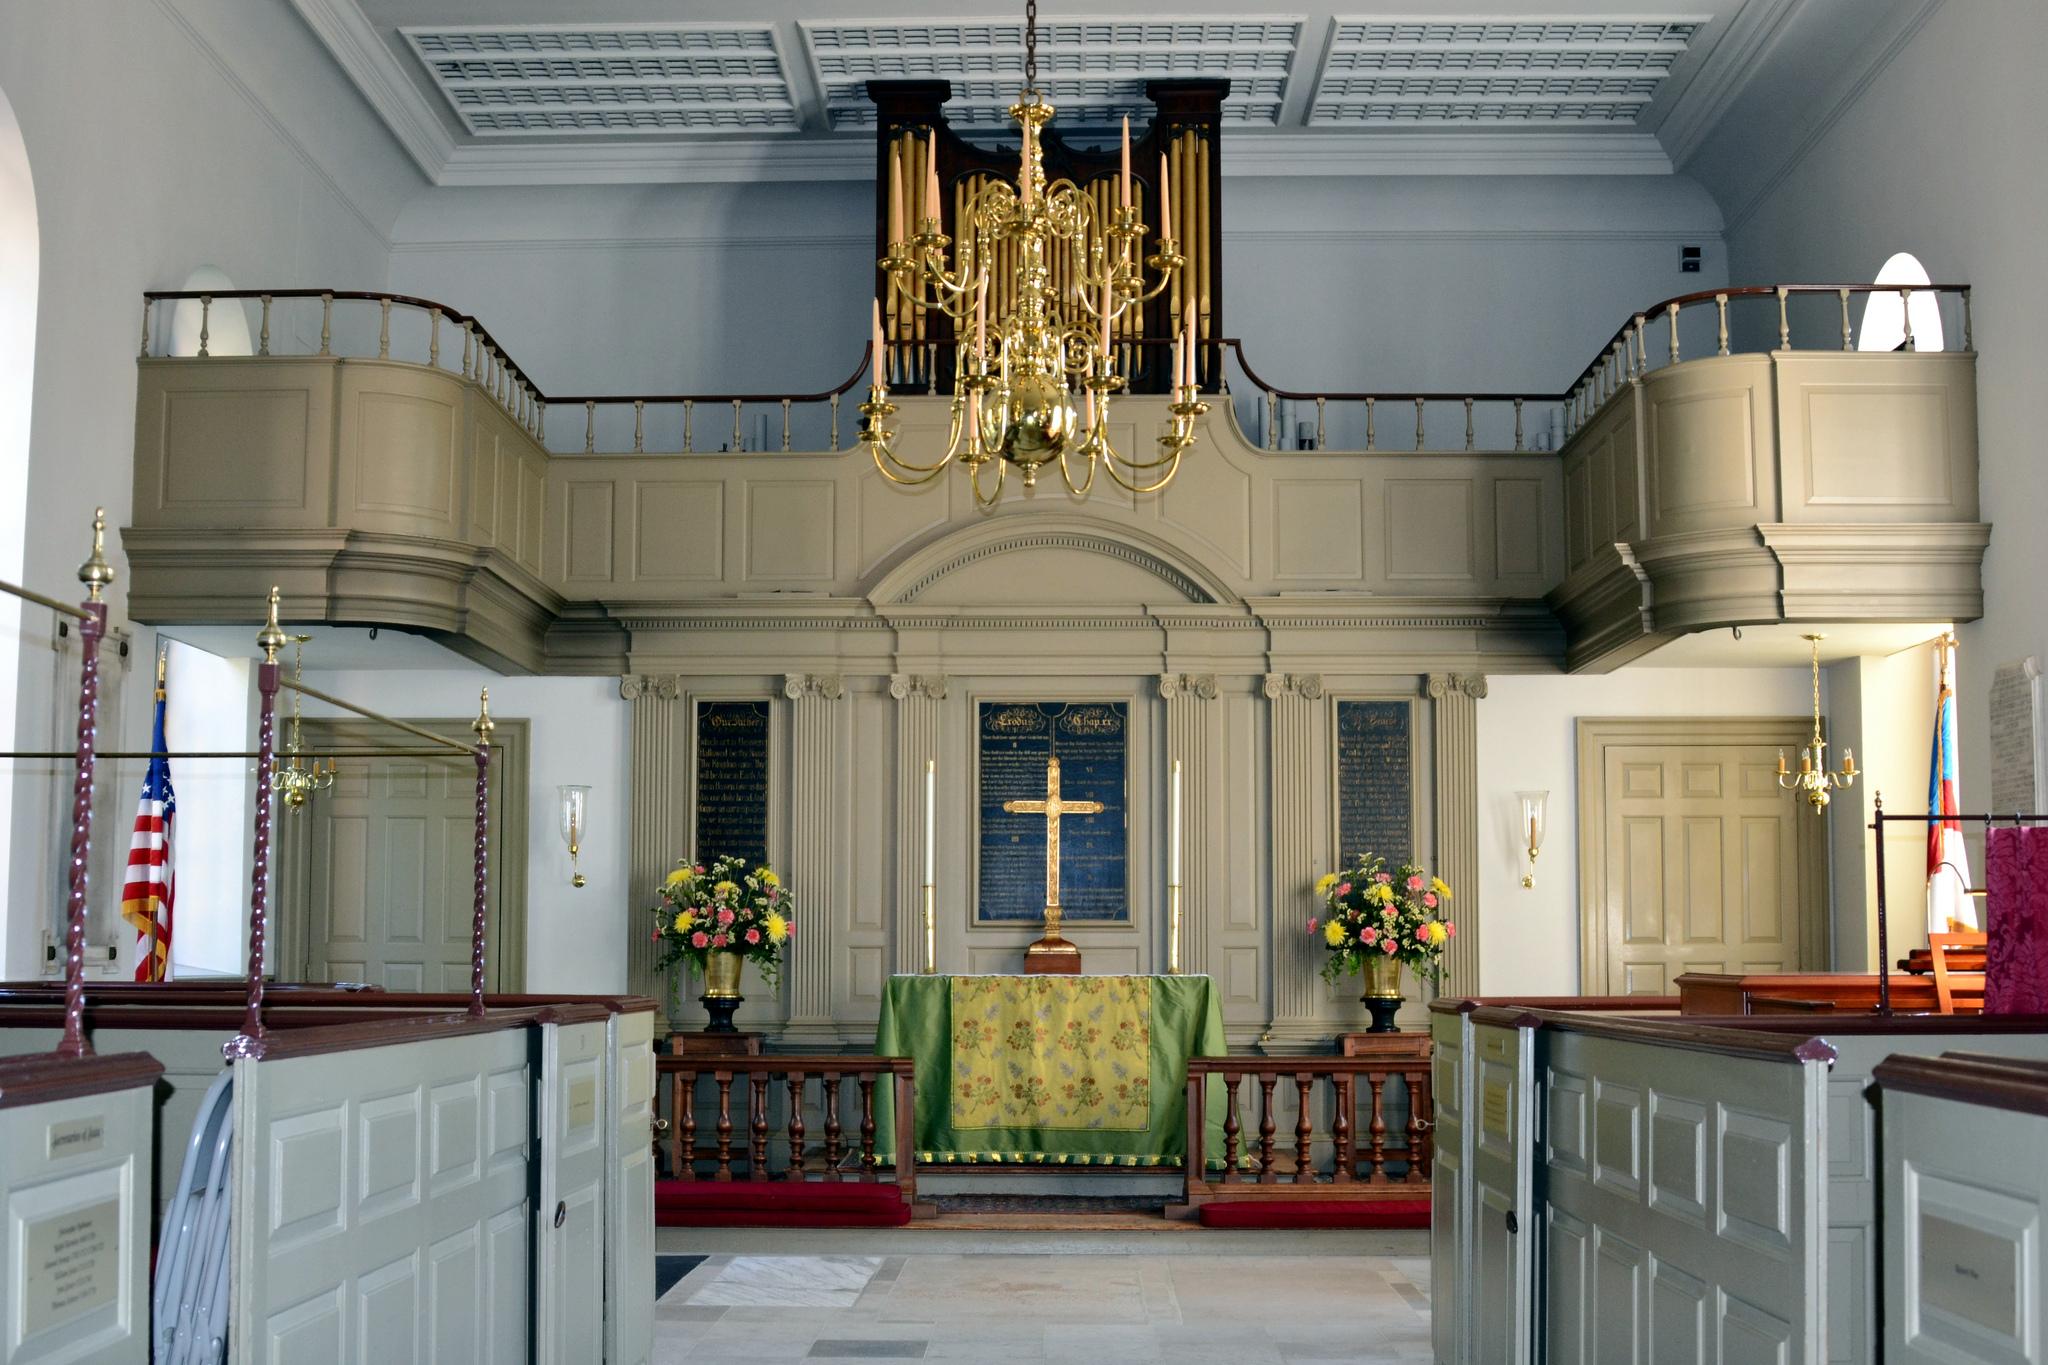 Bruton Parish Church interior. Image by Tony Alter, via Flickr 2.0 Creative Commons